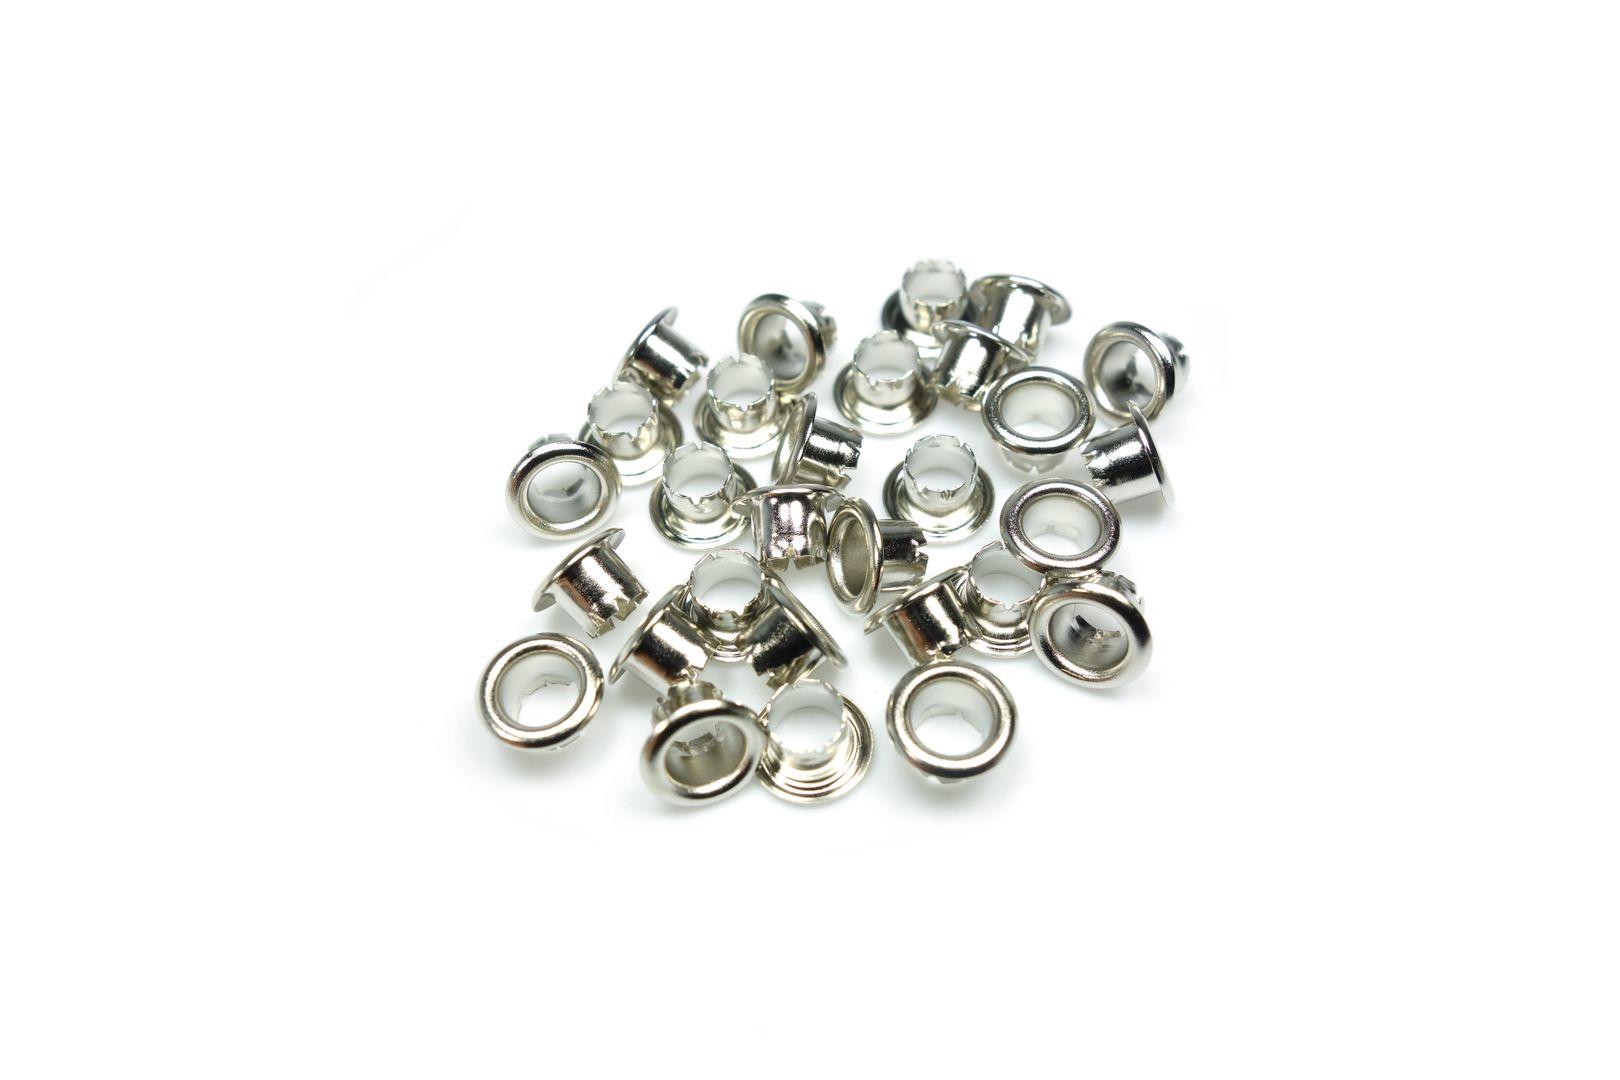 Eisenthaler 250 Ösen SET30-4.2mm, vernickelt für 10-20 Blatt – Bild 2